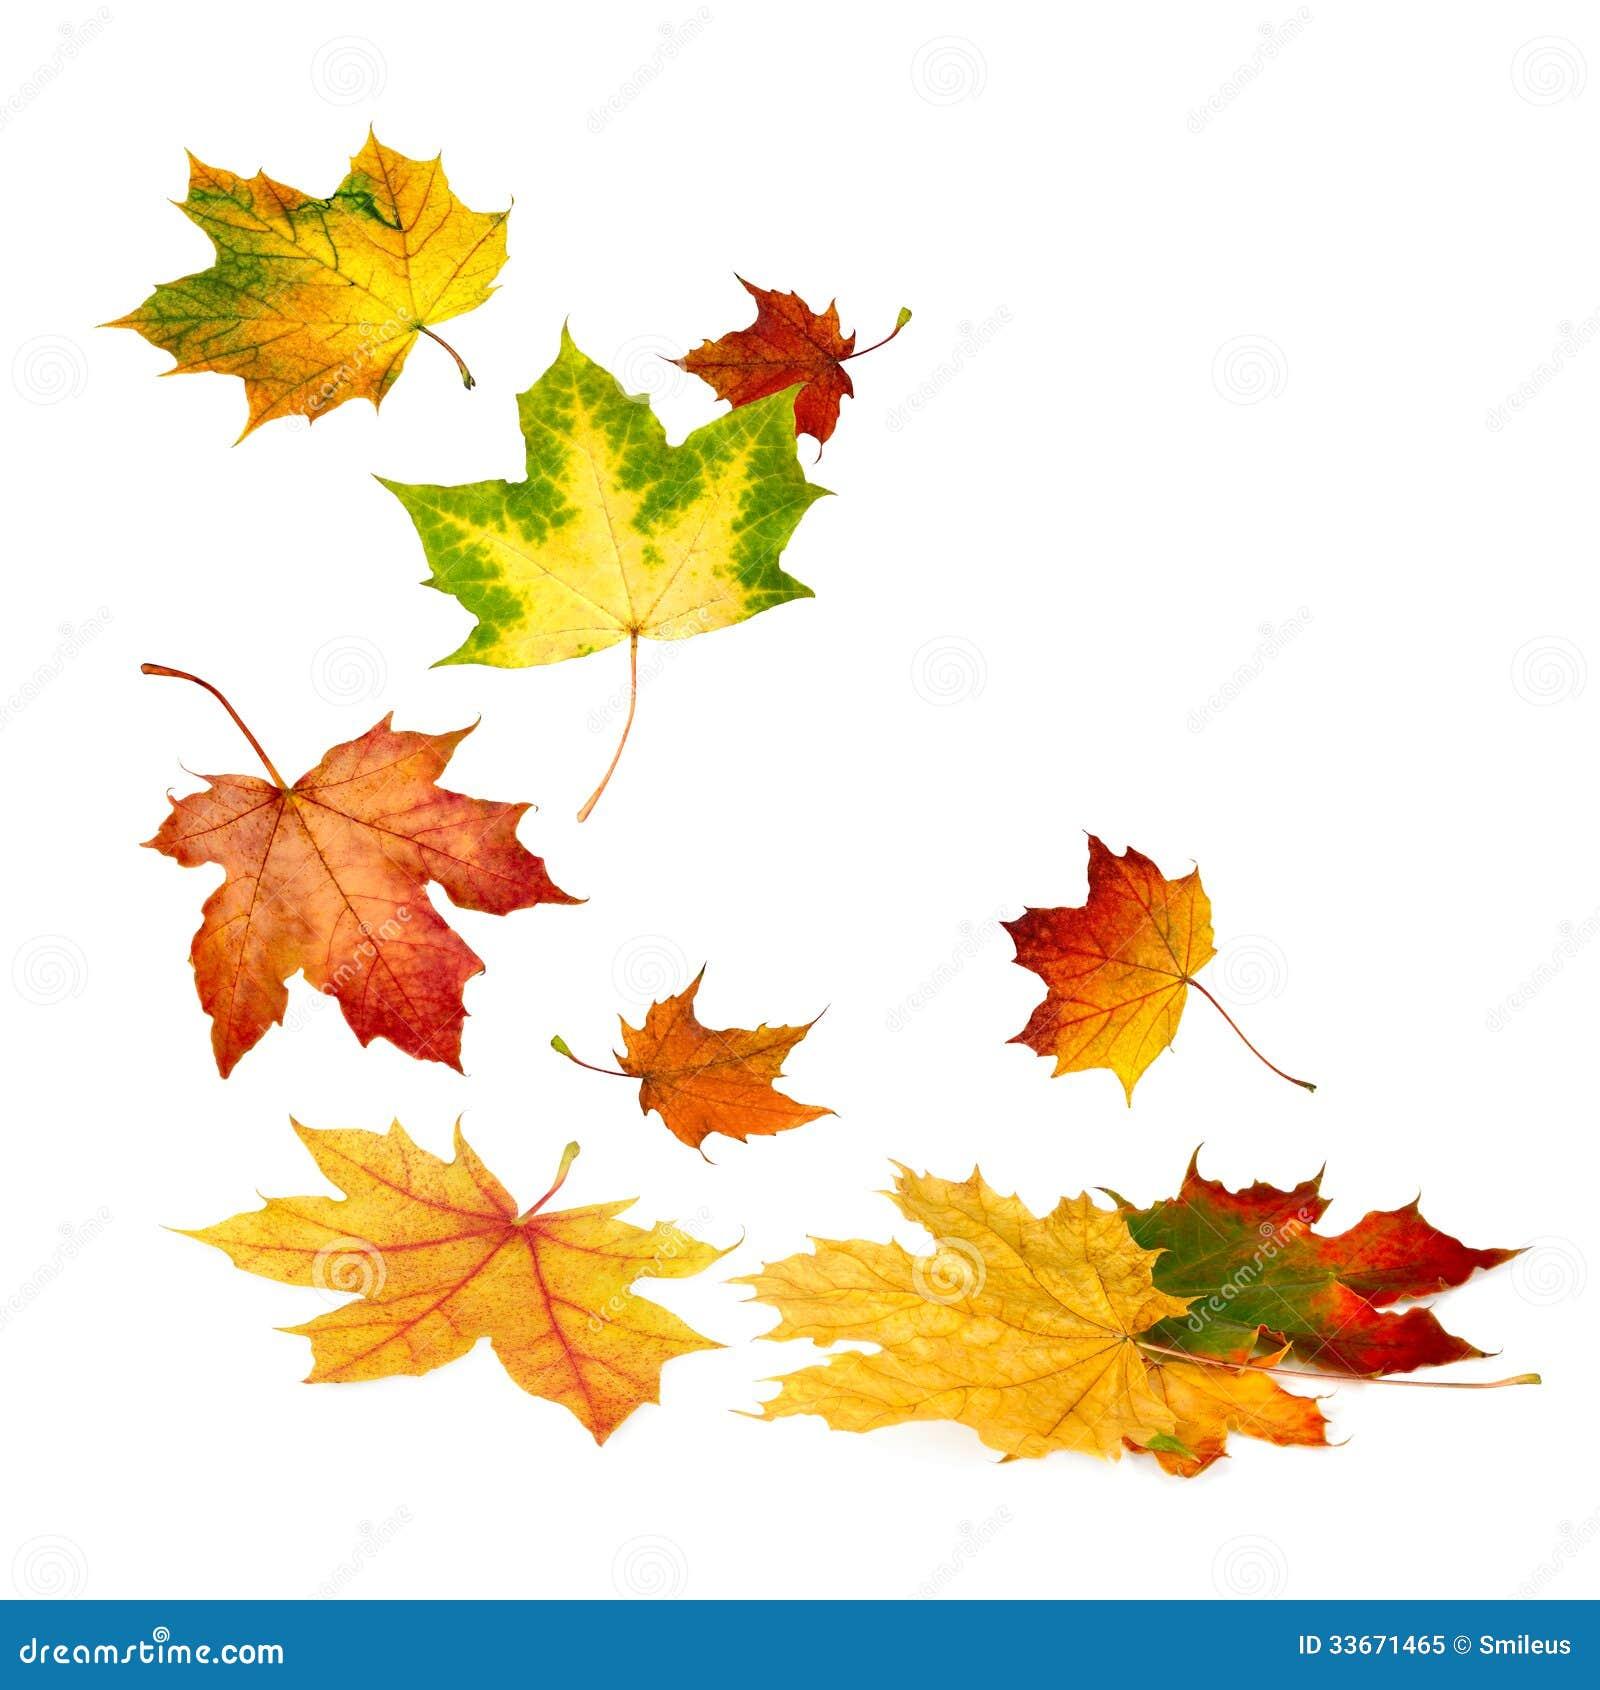 Beautiful autumn leaves falling down